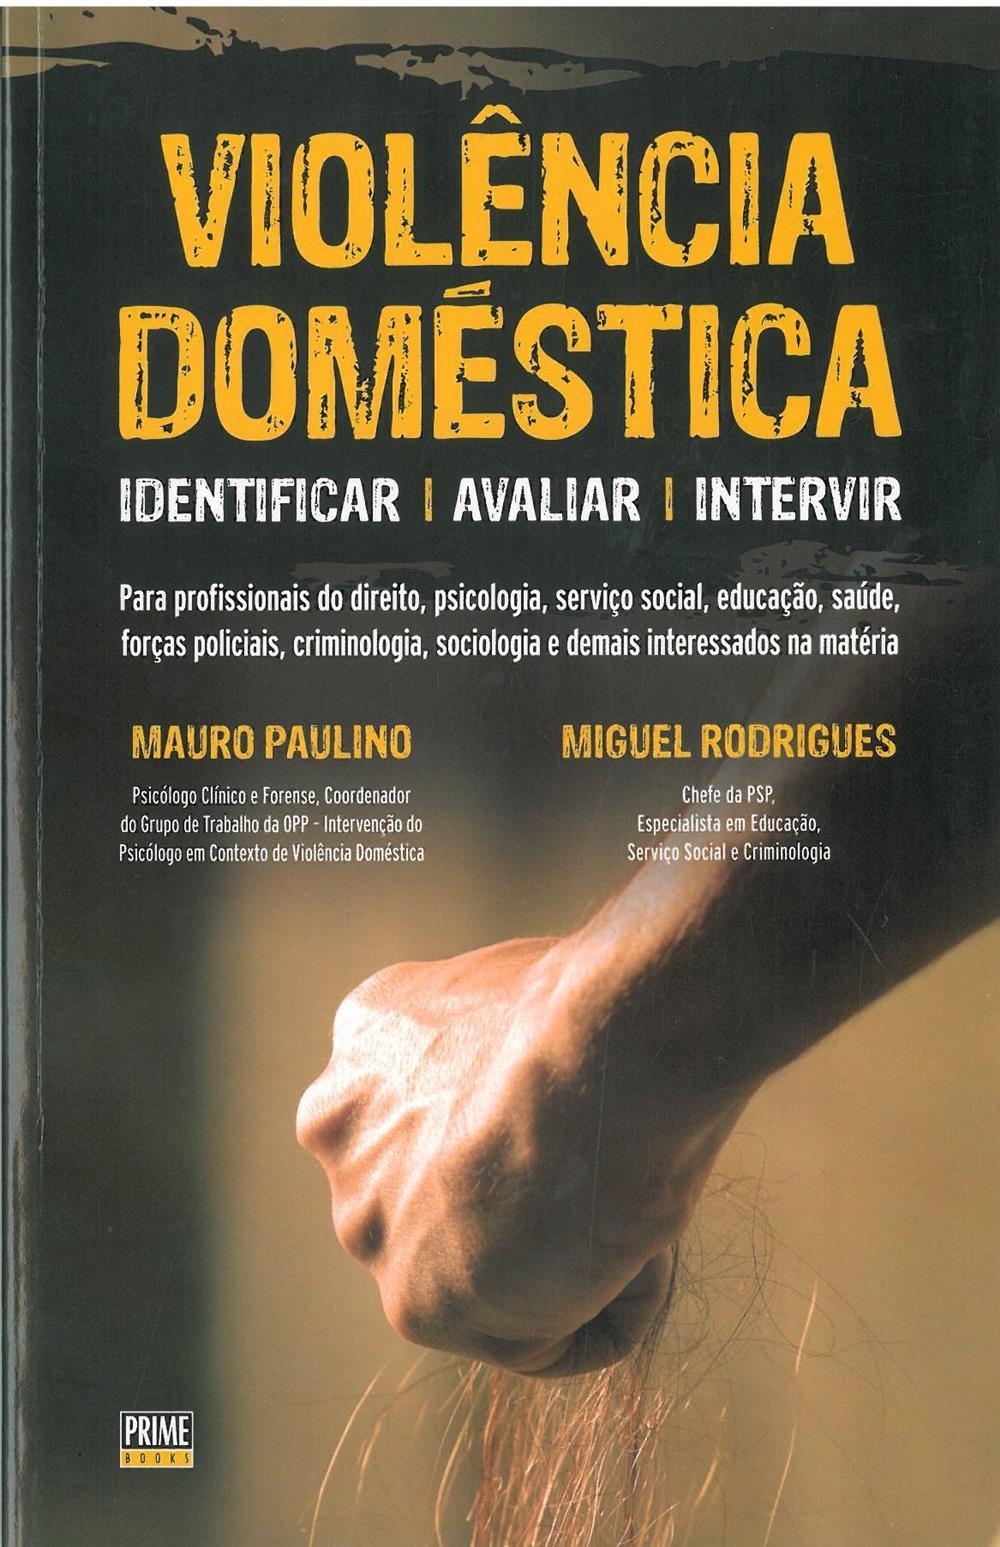 Violência doméstica_.jpg